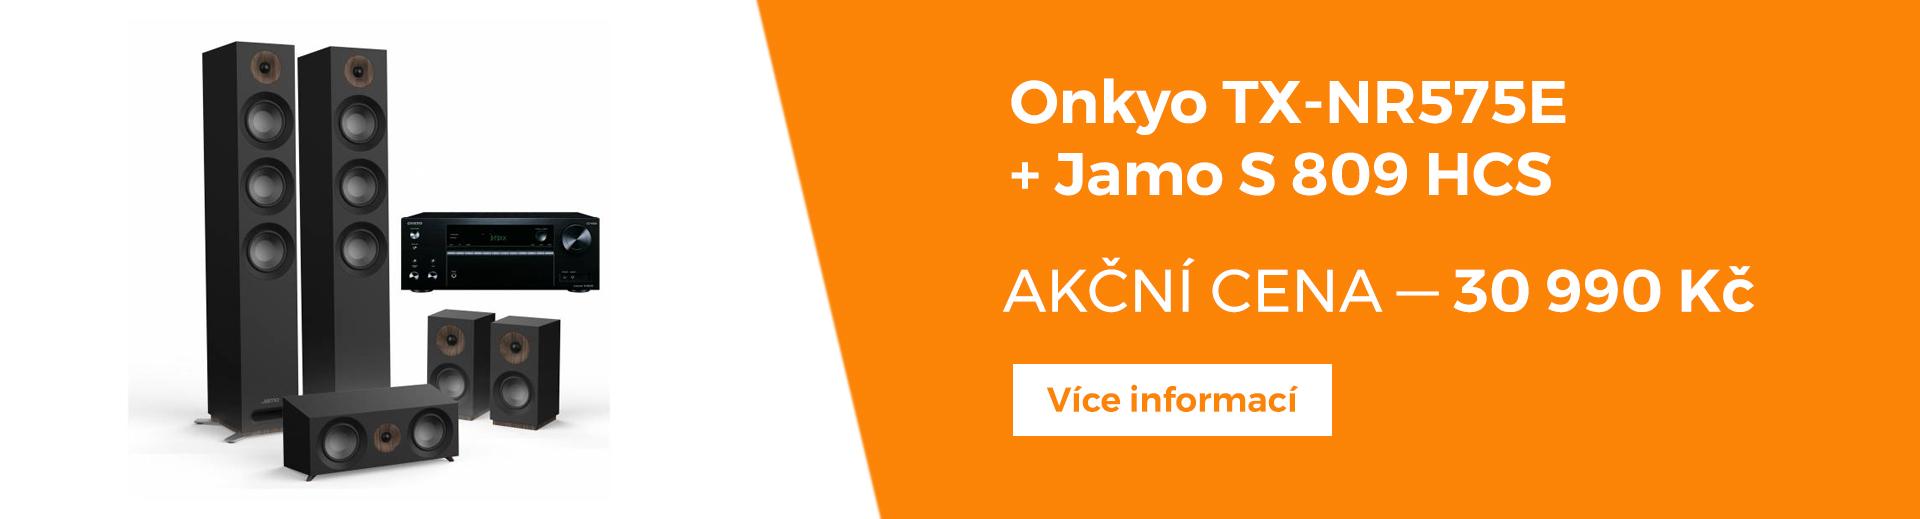 Onkyo + Jamo